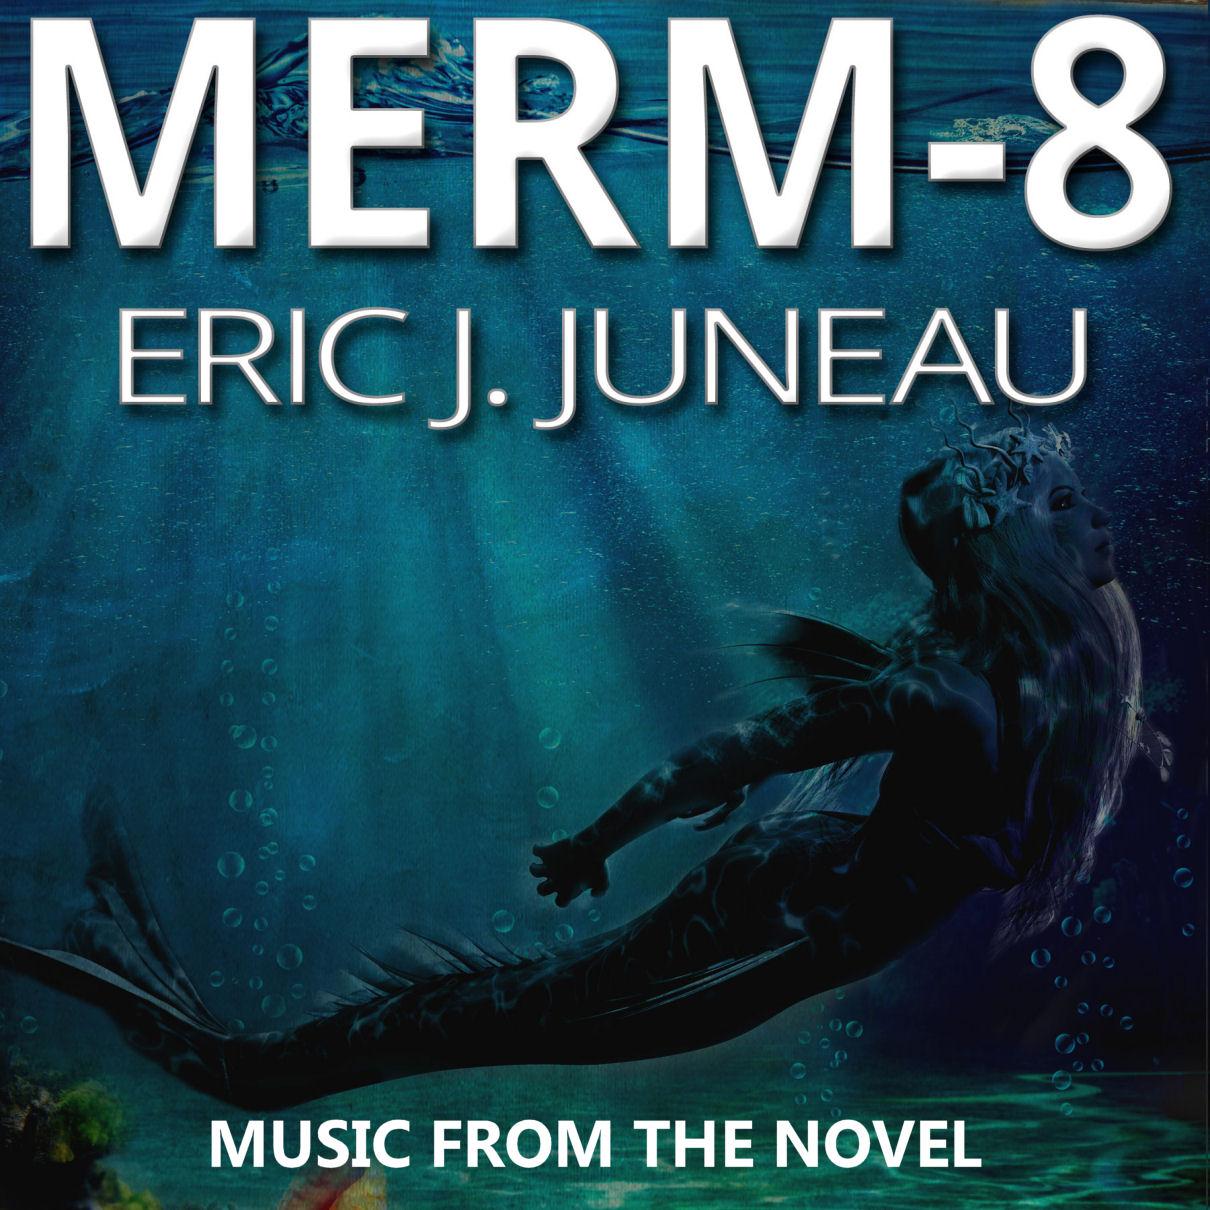 The Merm-8 Soundtrack